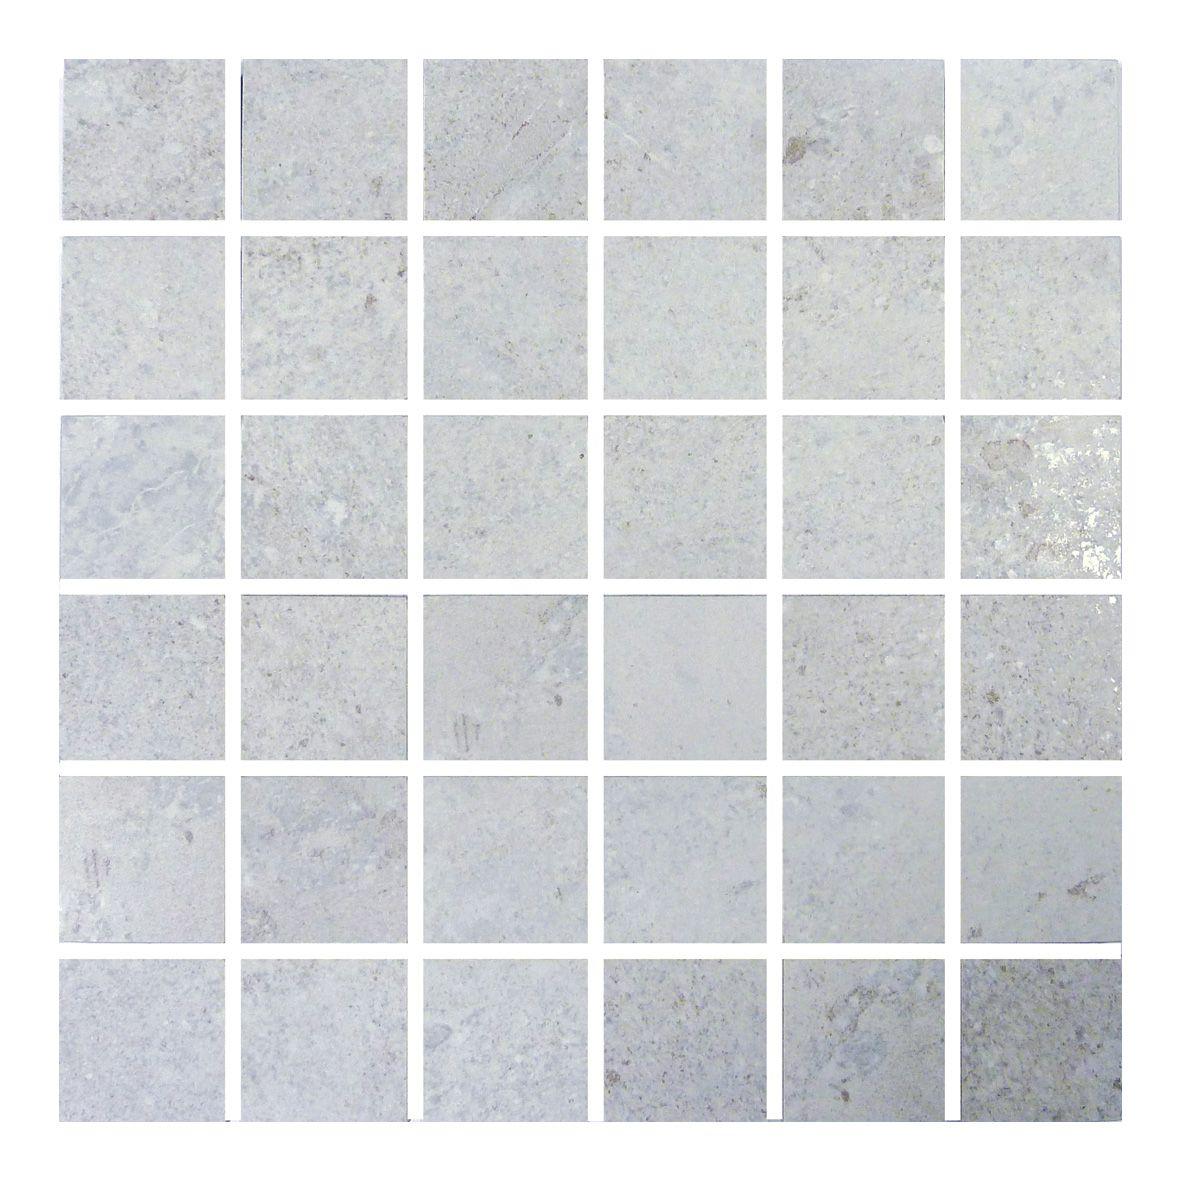 Gemini Hillock Light Grey Mosaic Bathroom, Kitchen, Wetroom, Living ...